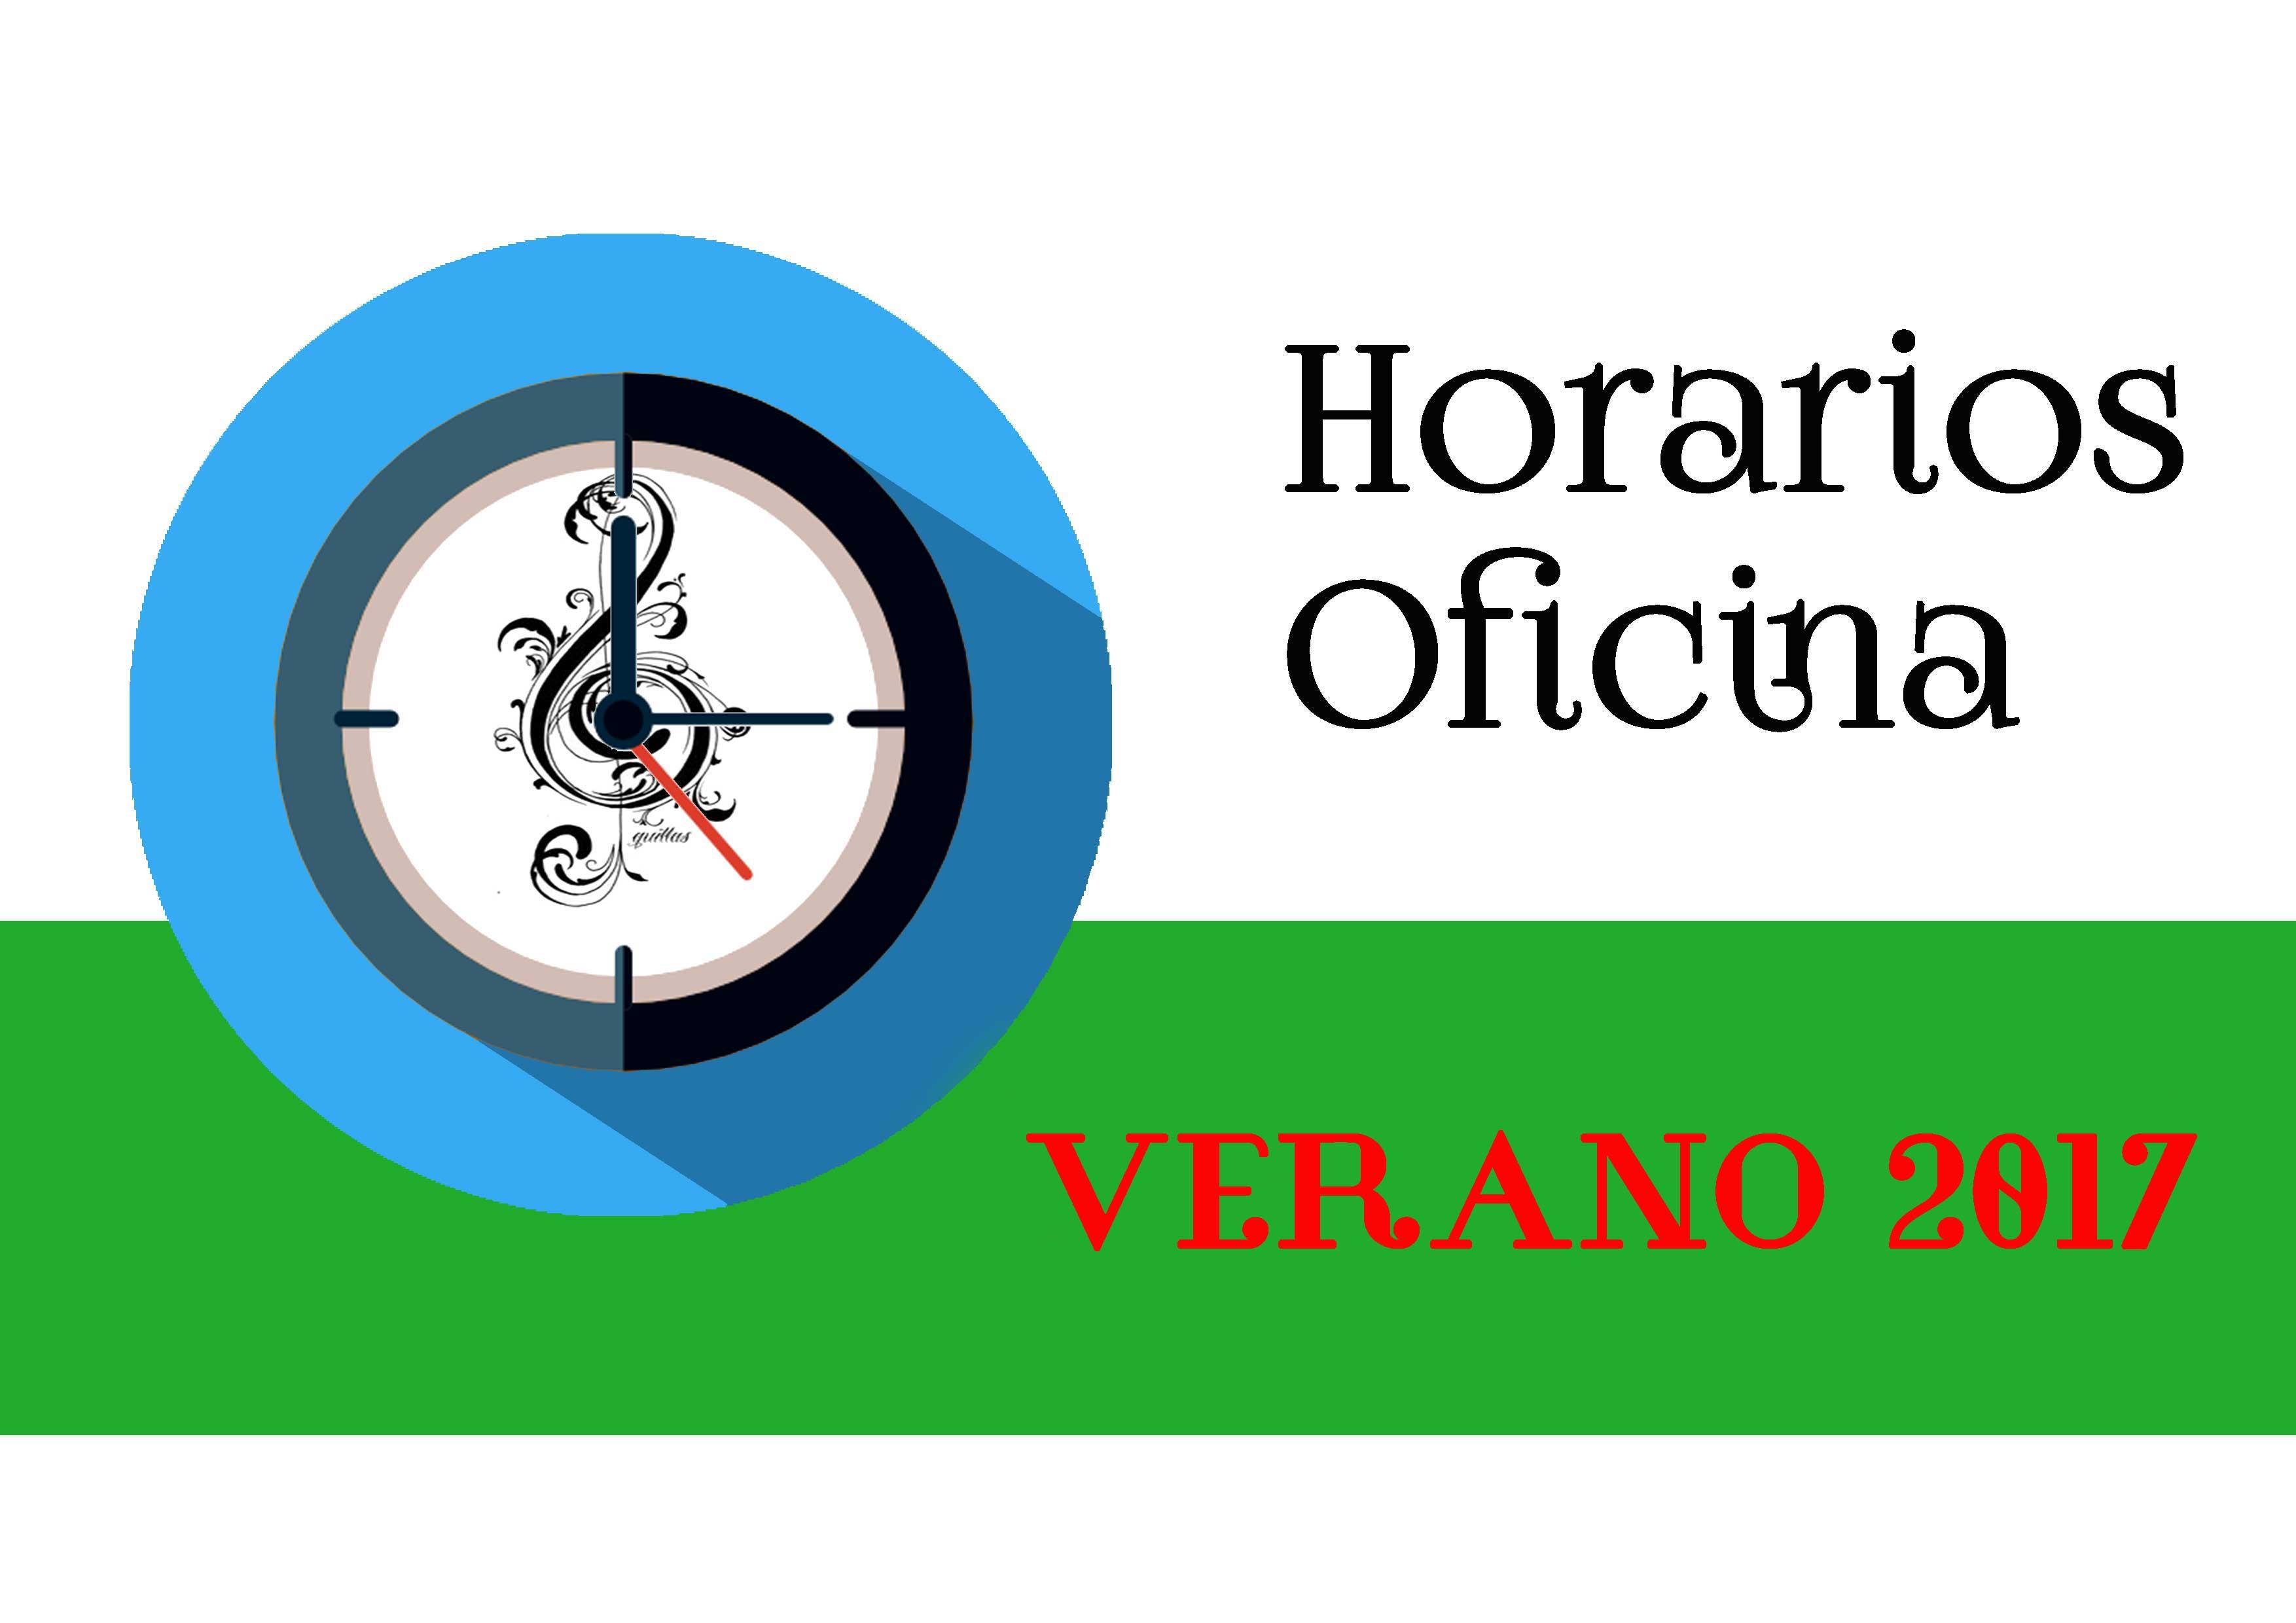 Horarios oficina verano 2017 ateneo musical de bembrive for Horario oficina adeslas